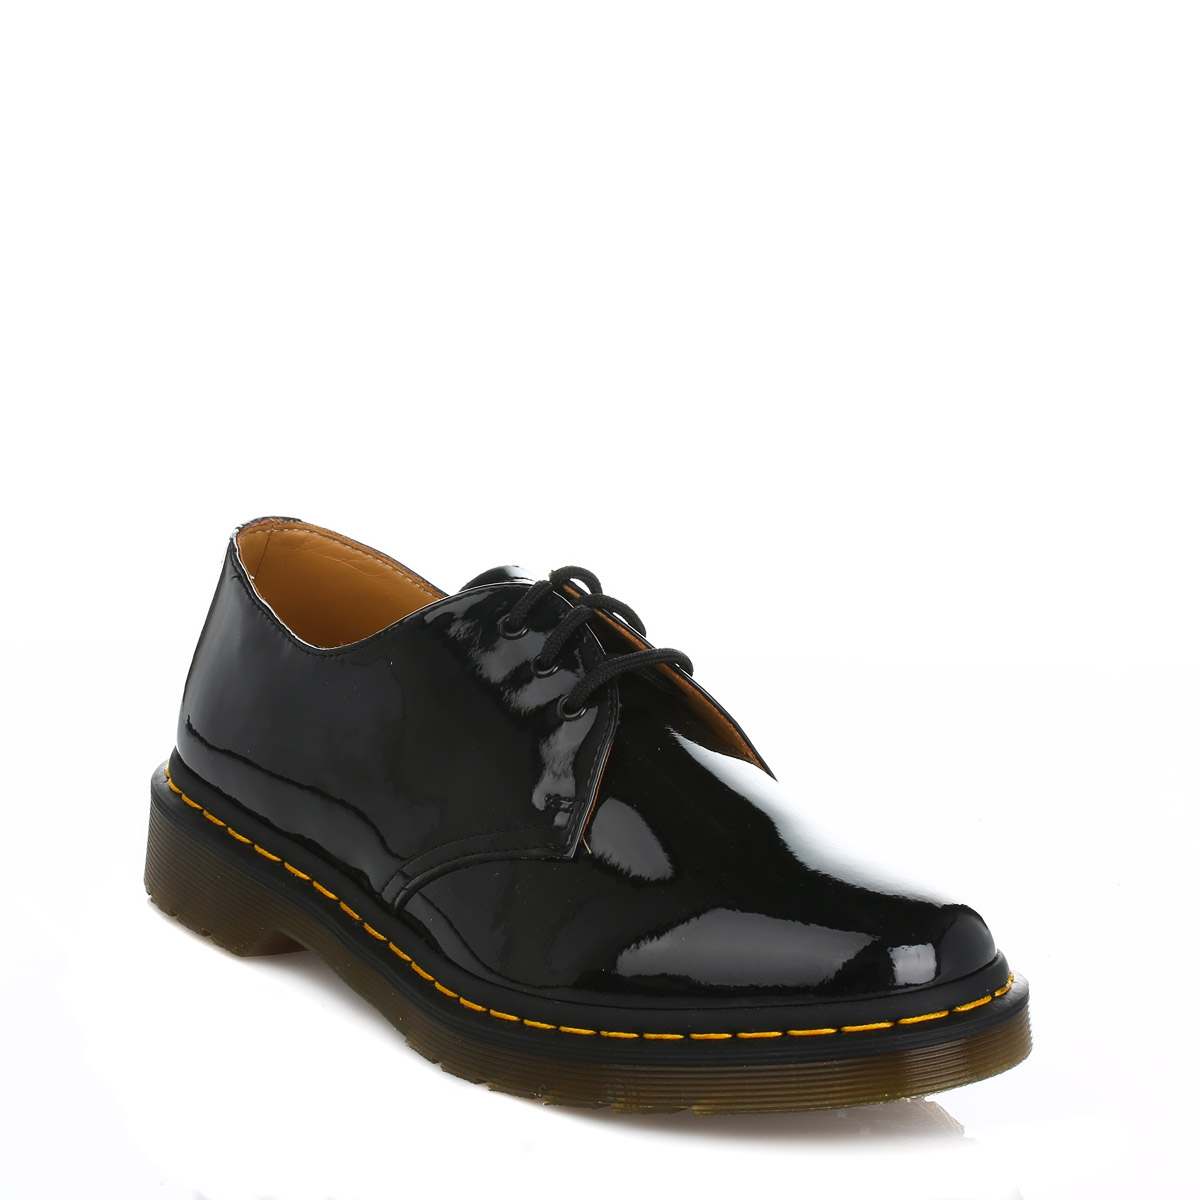 dr martens mens womens docs shoes leather casual lace up low formal smart ebay. Black Bedroom Furniture Sets. Home Design Ideas